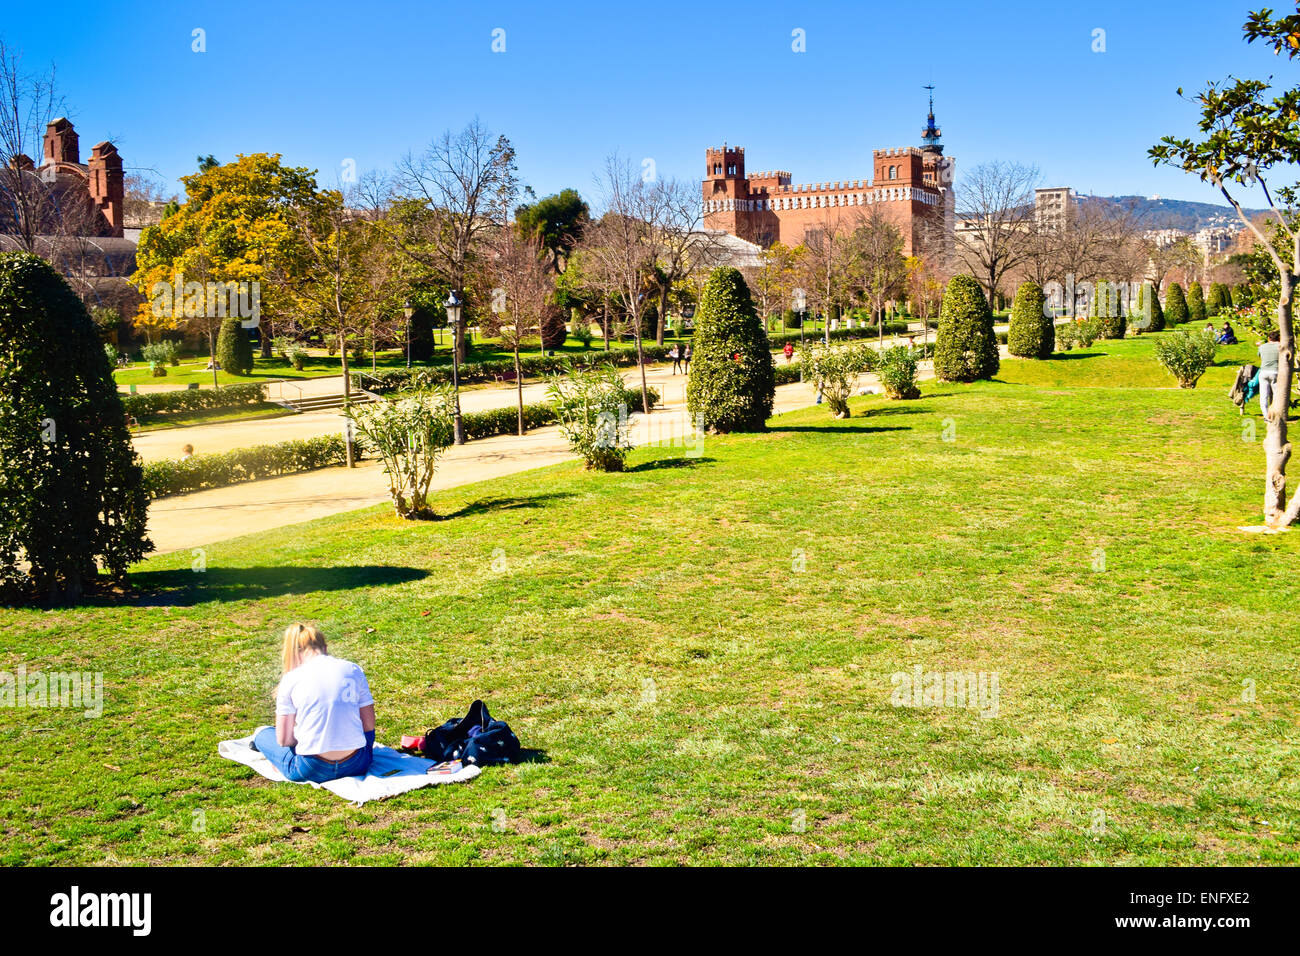 Ciutadella Park. Parc de la Ciutadella, Barcelona, Catalonia, Spain. - Stock Image